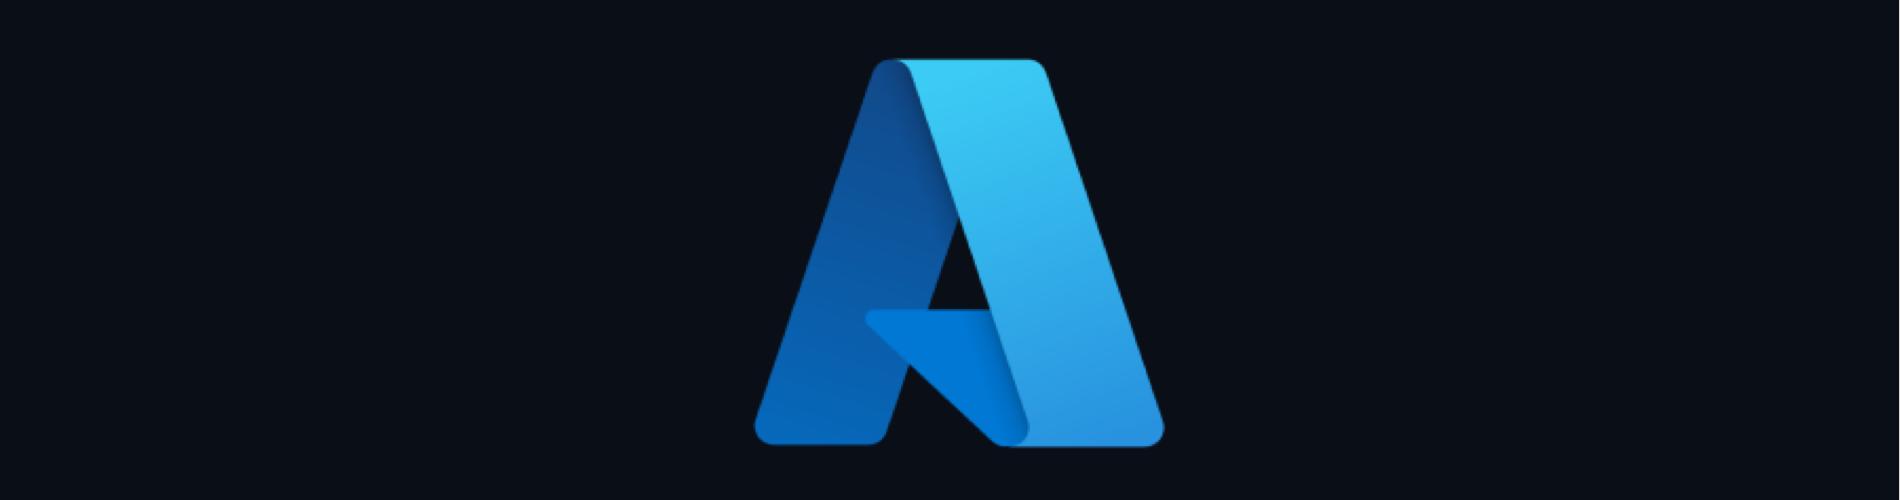 Azure Cloud Onramp feature image